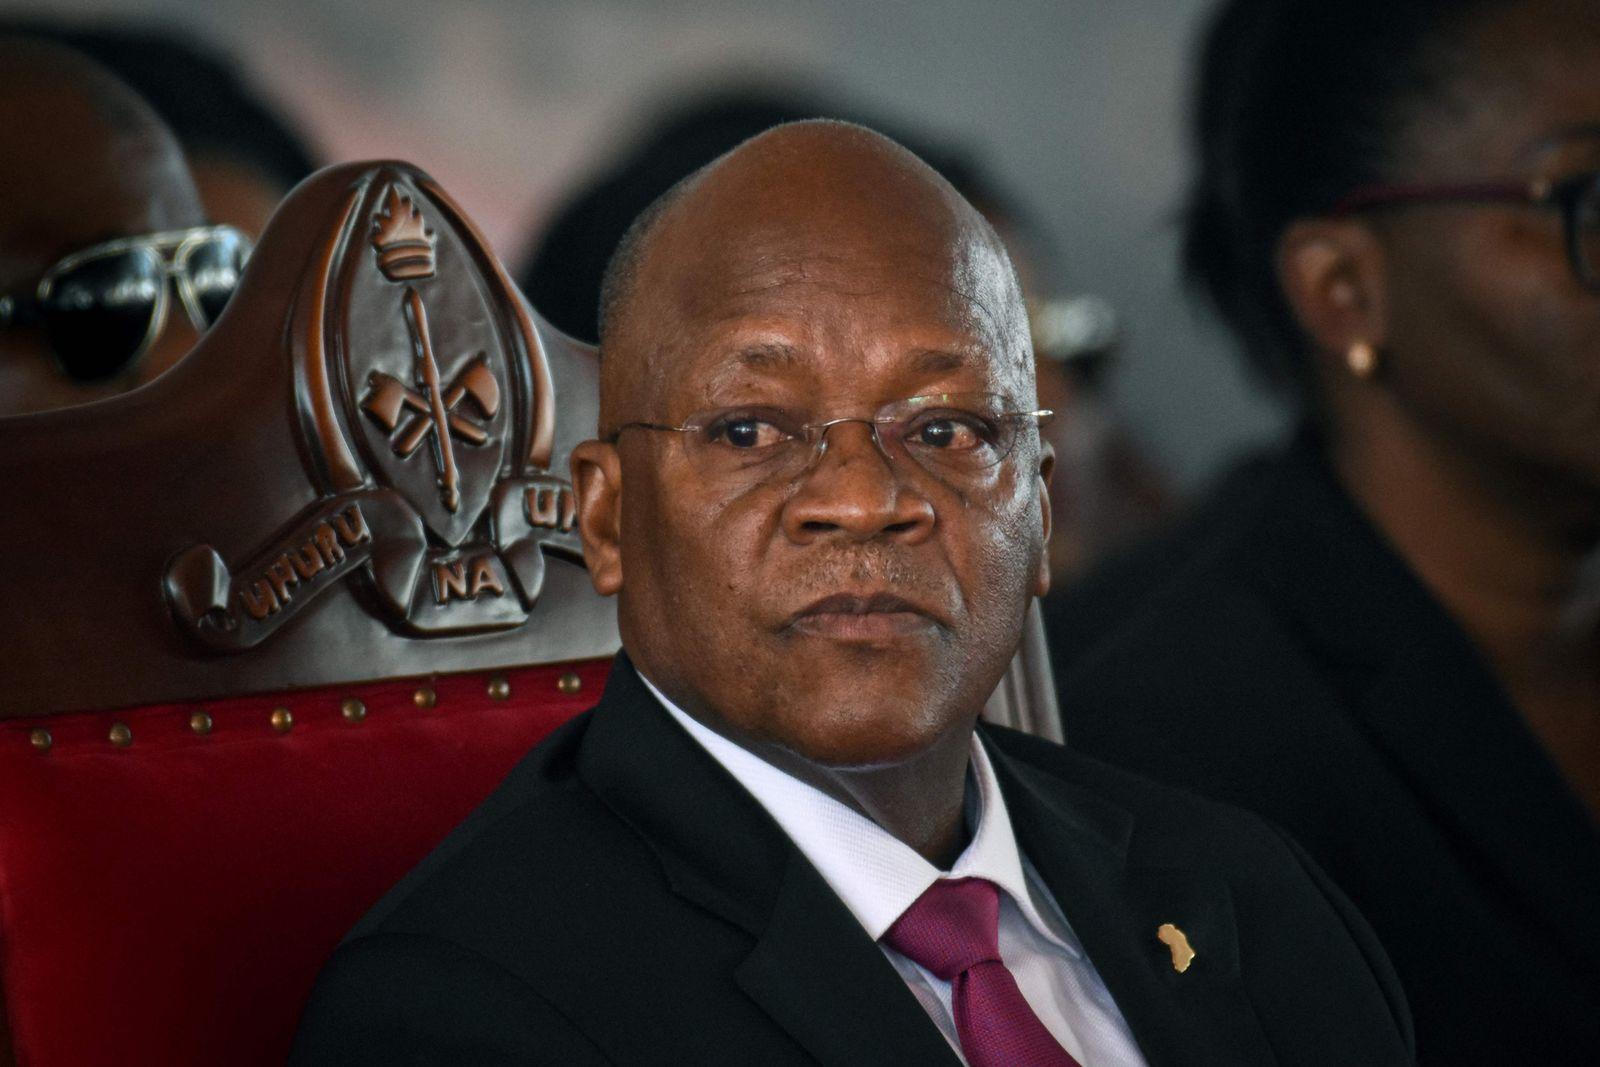 FILES-TANZANIA-POLITICS-FUNERAL-DIPLOMACY